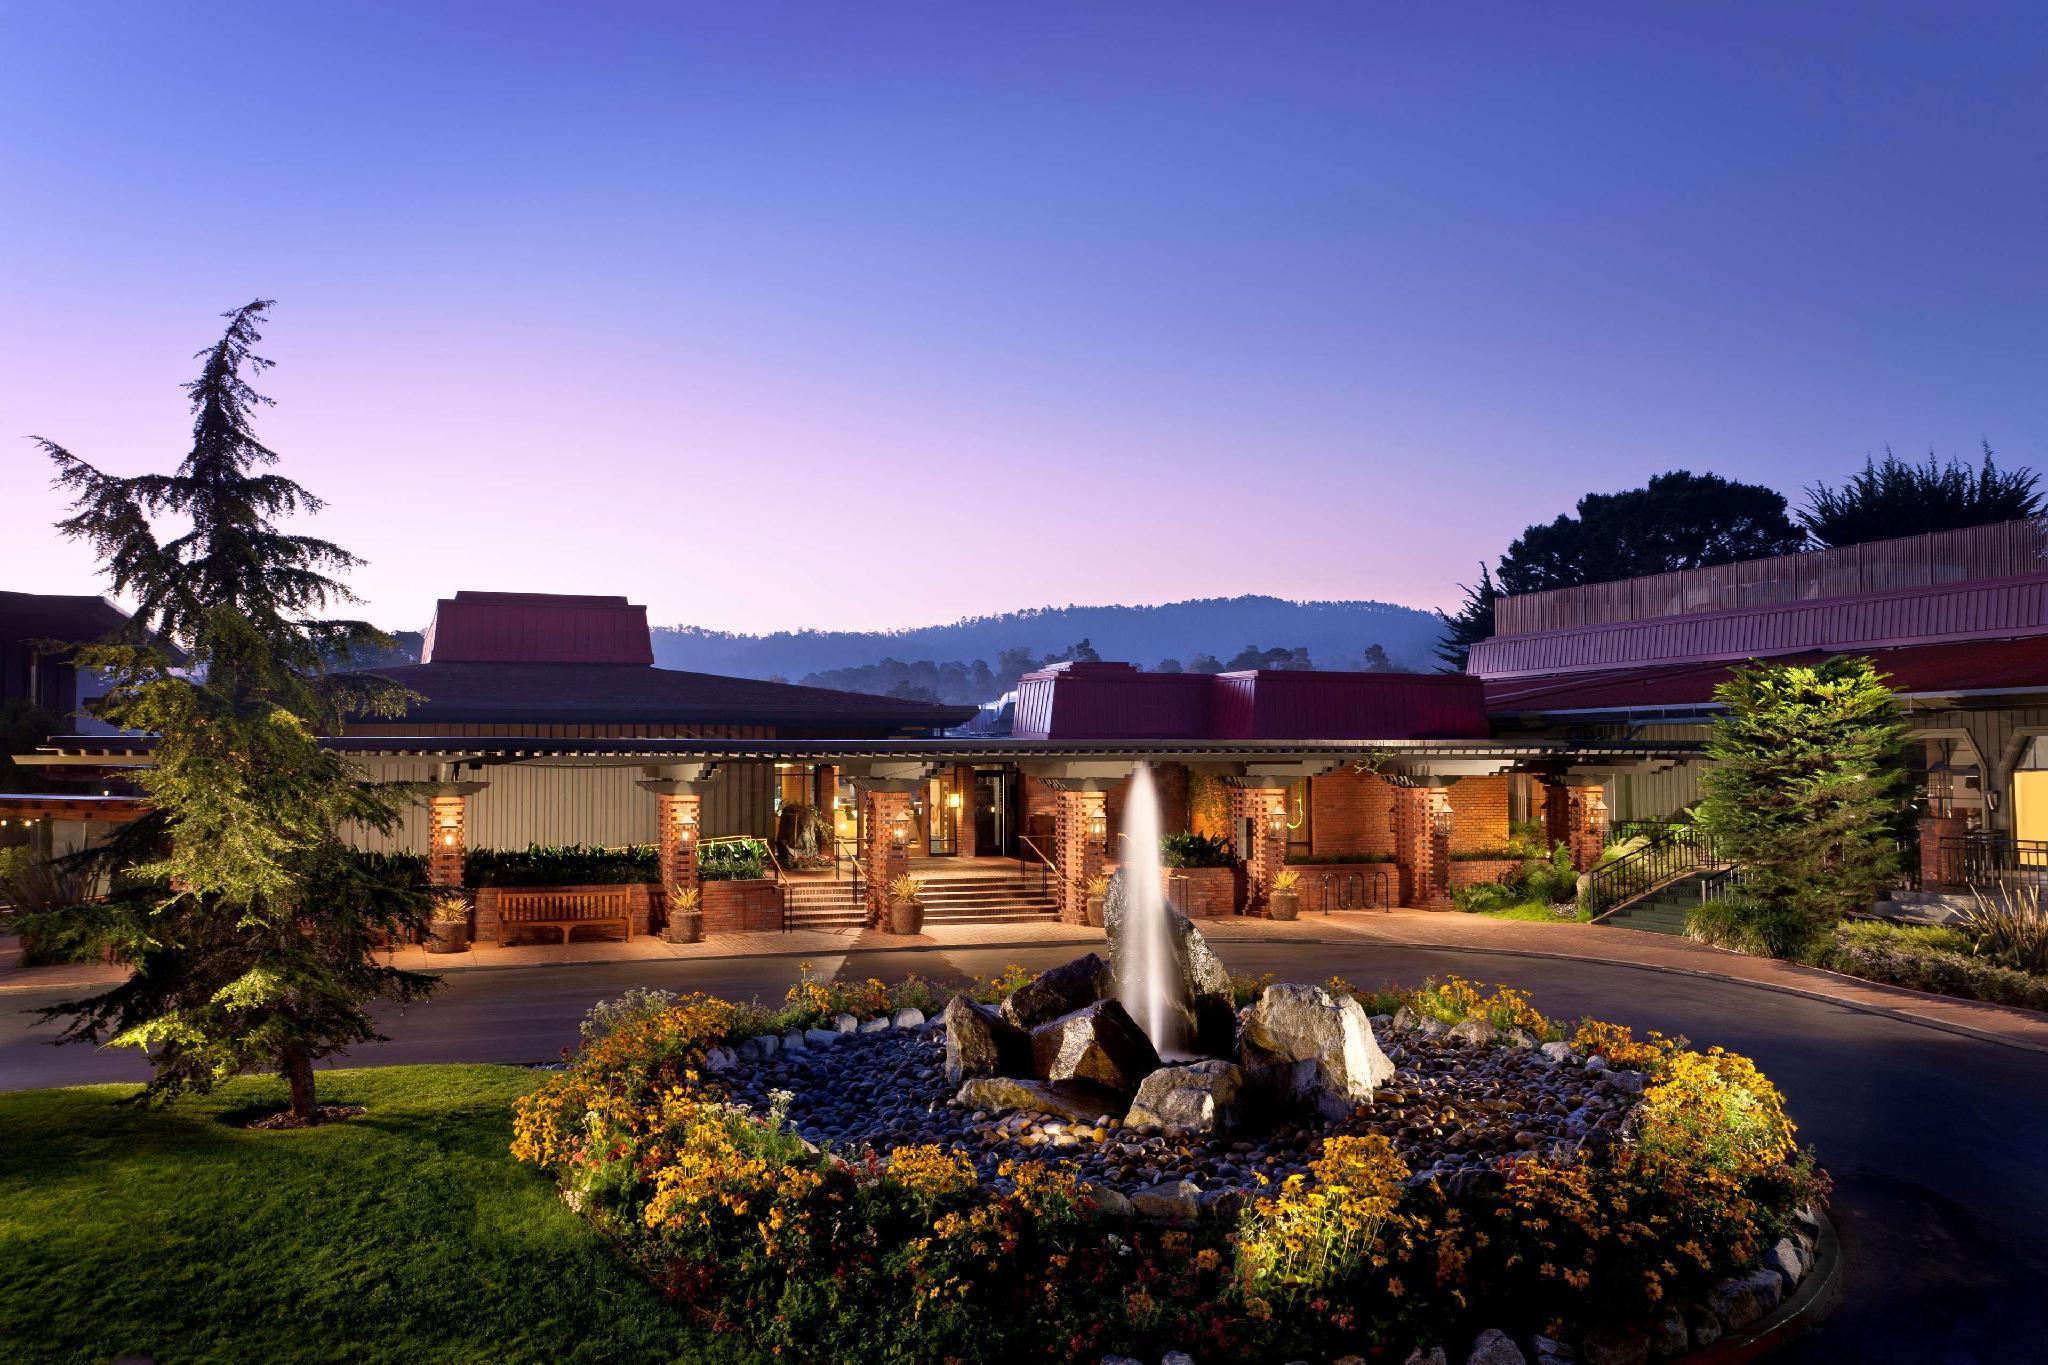 Hyatt Regency Monterey Hotel & Spa image